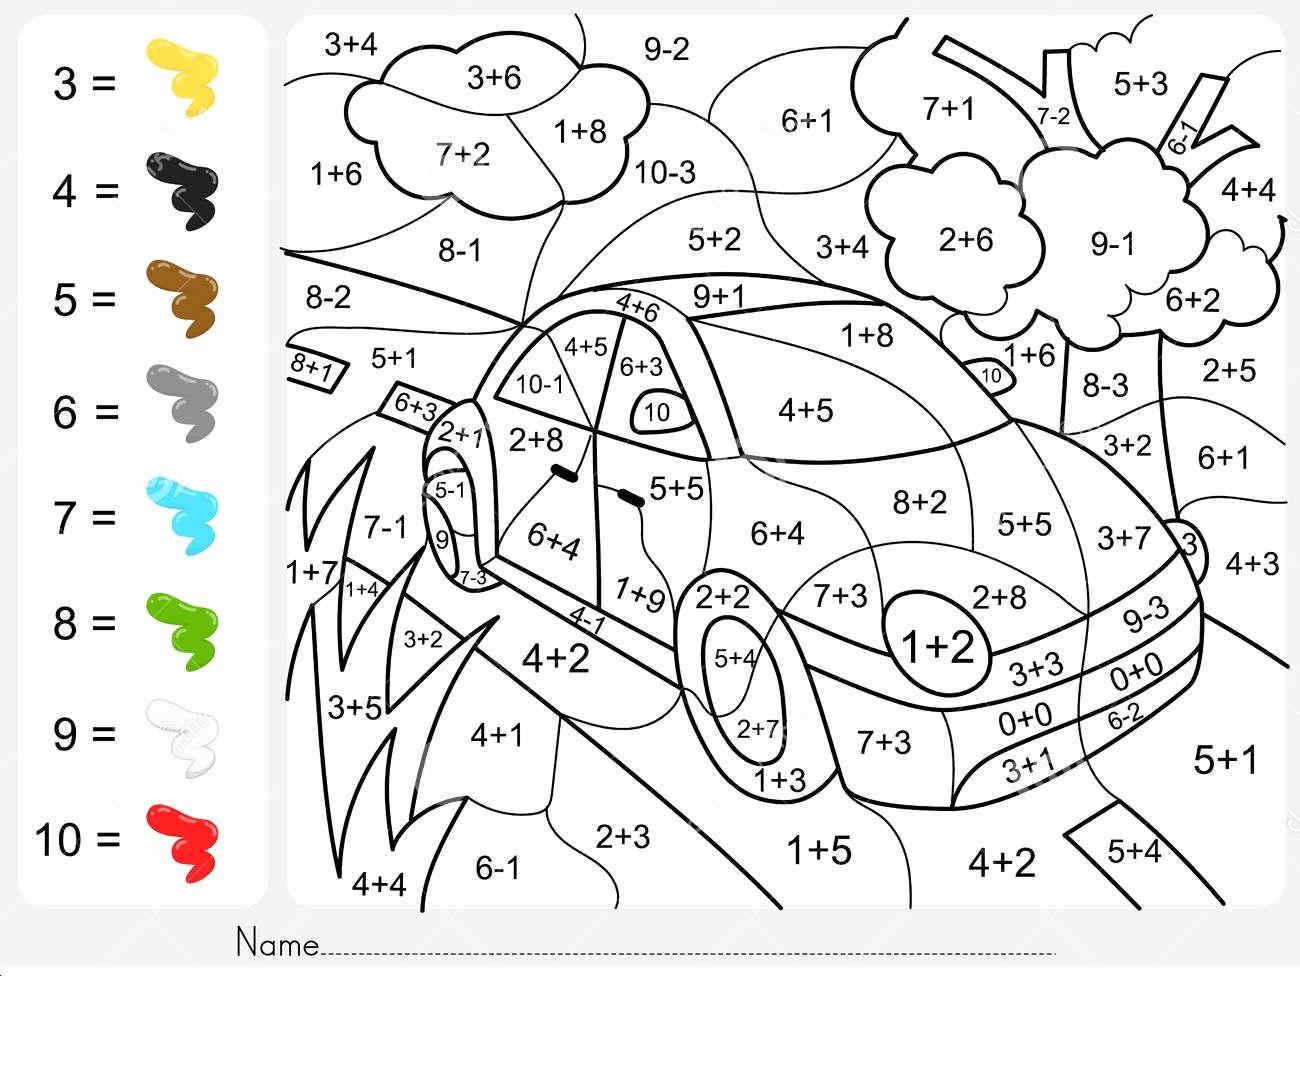 Coloring Addition Worksheet Inspirational Addition and Subtraction Coloring Worksheets for 2nd Grade